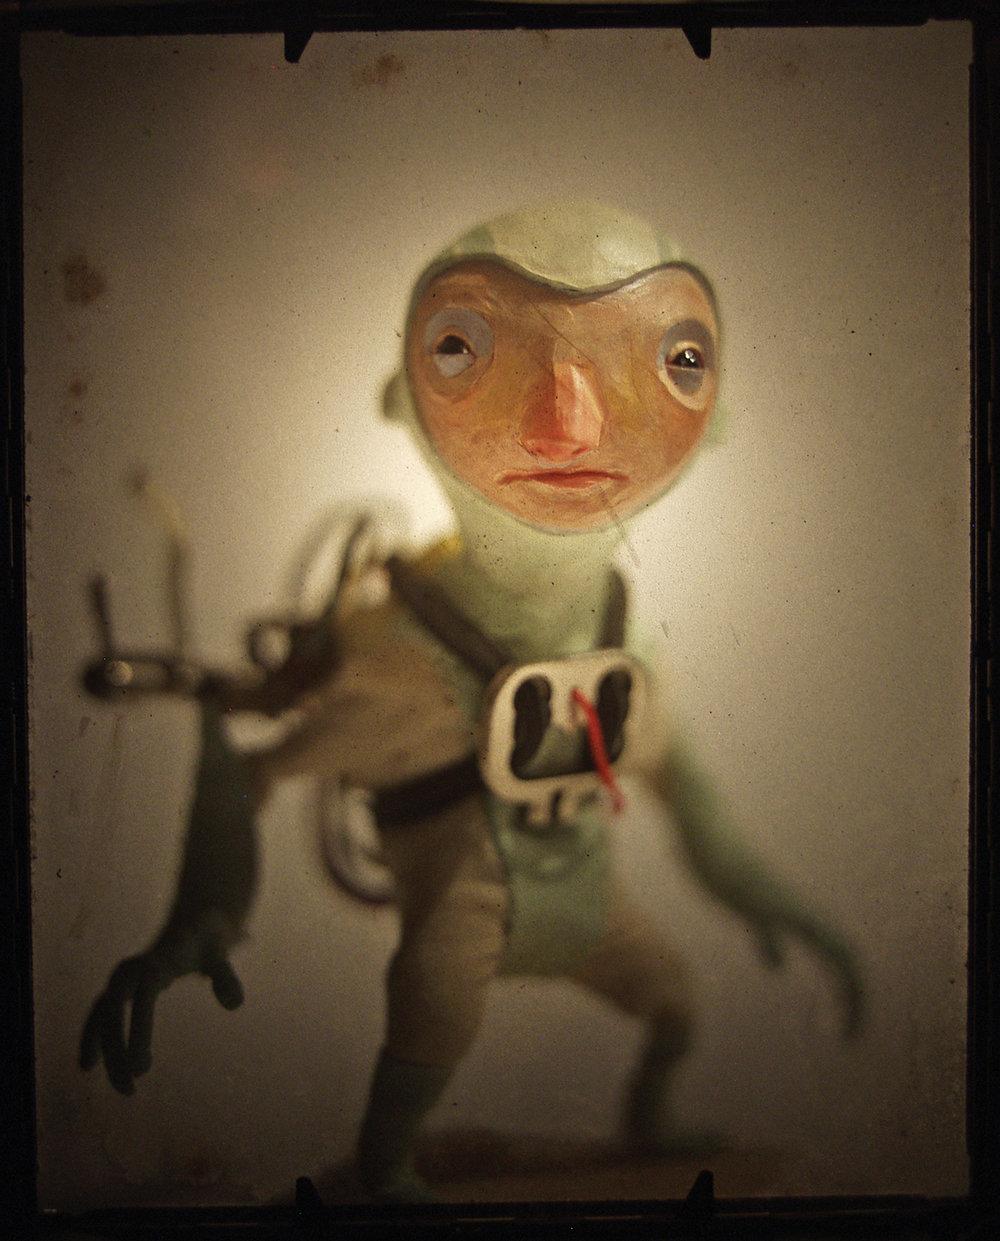 3x3 2008 - ARTIST: Red Nose StudioTITLE: Elemi